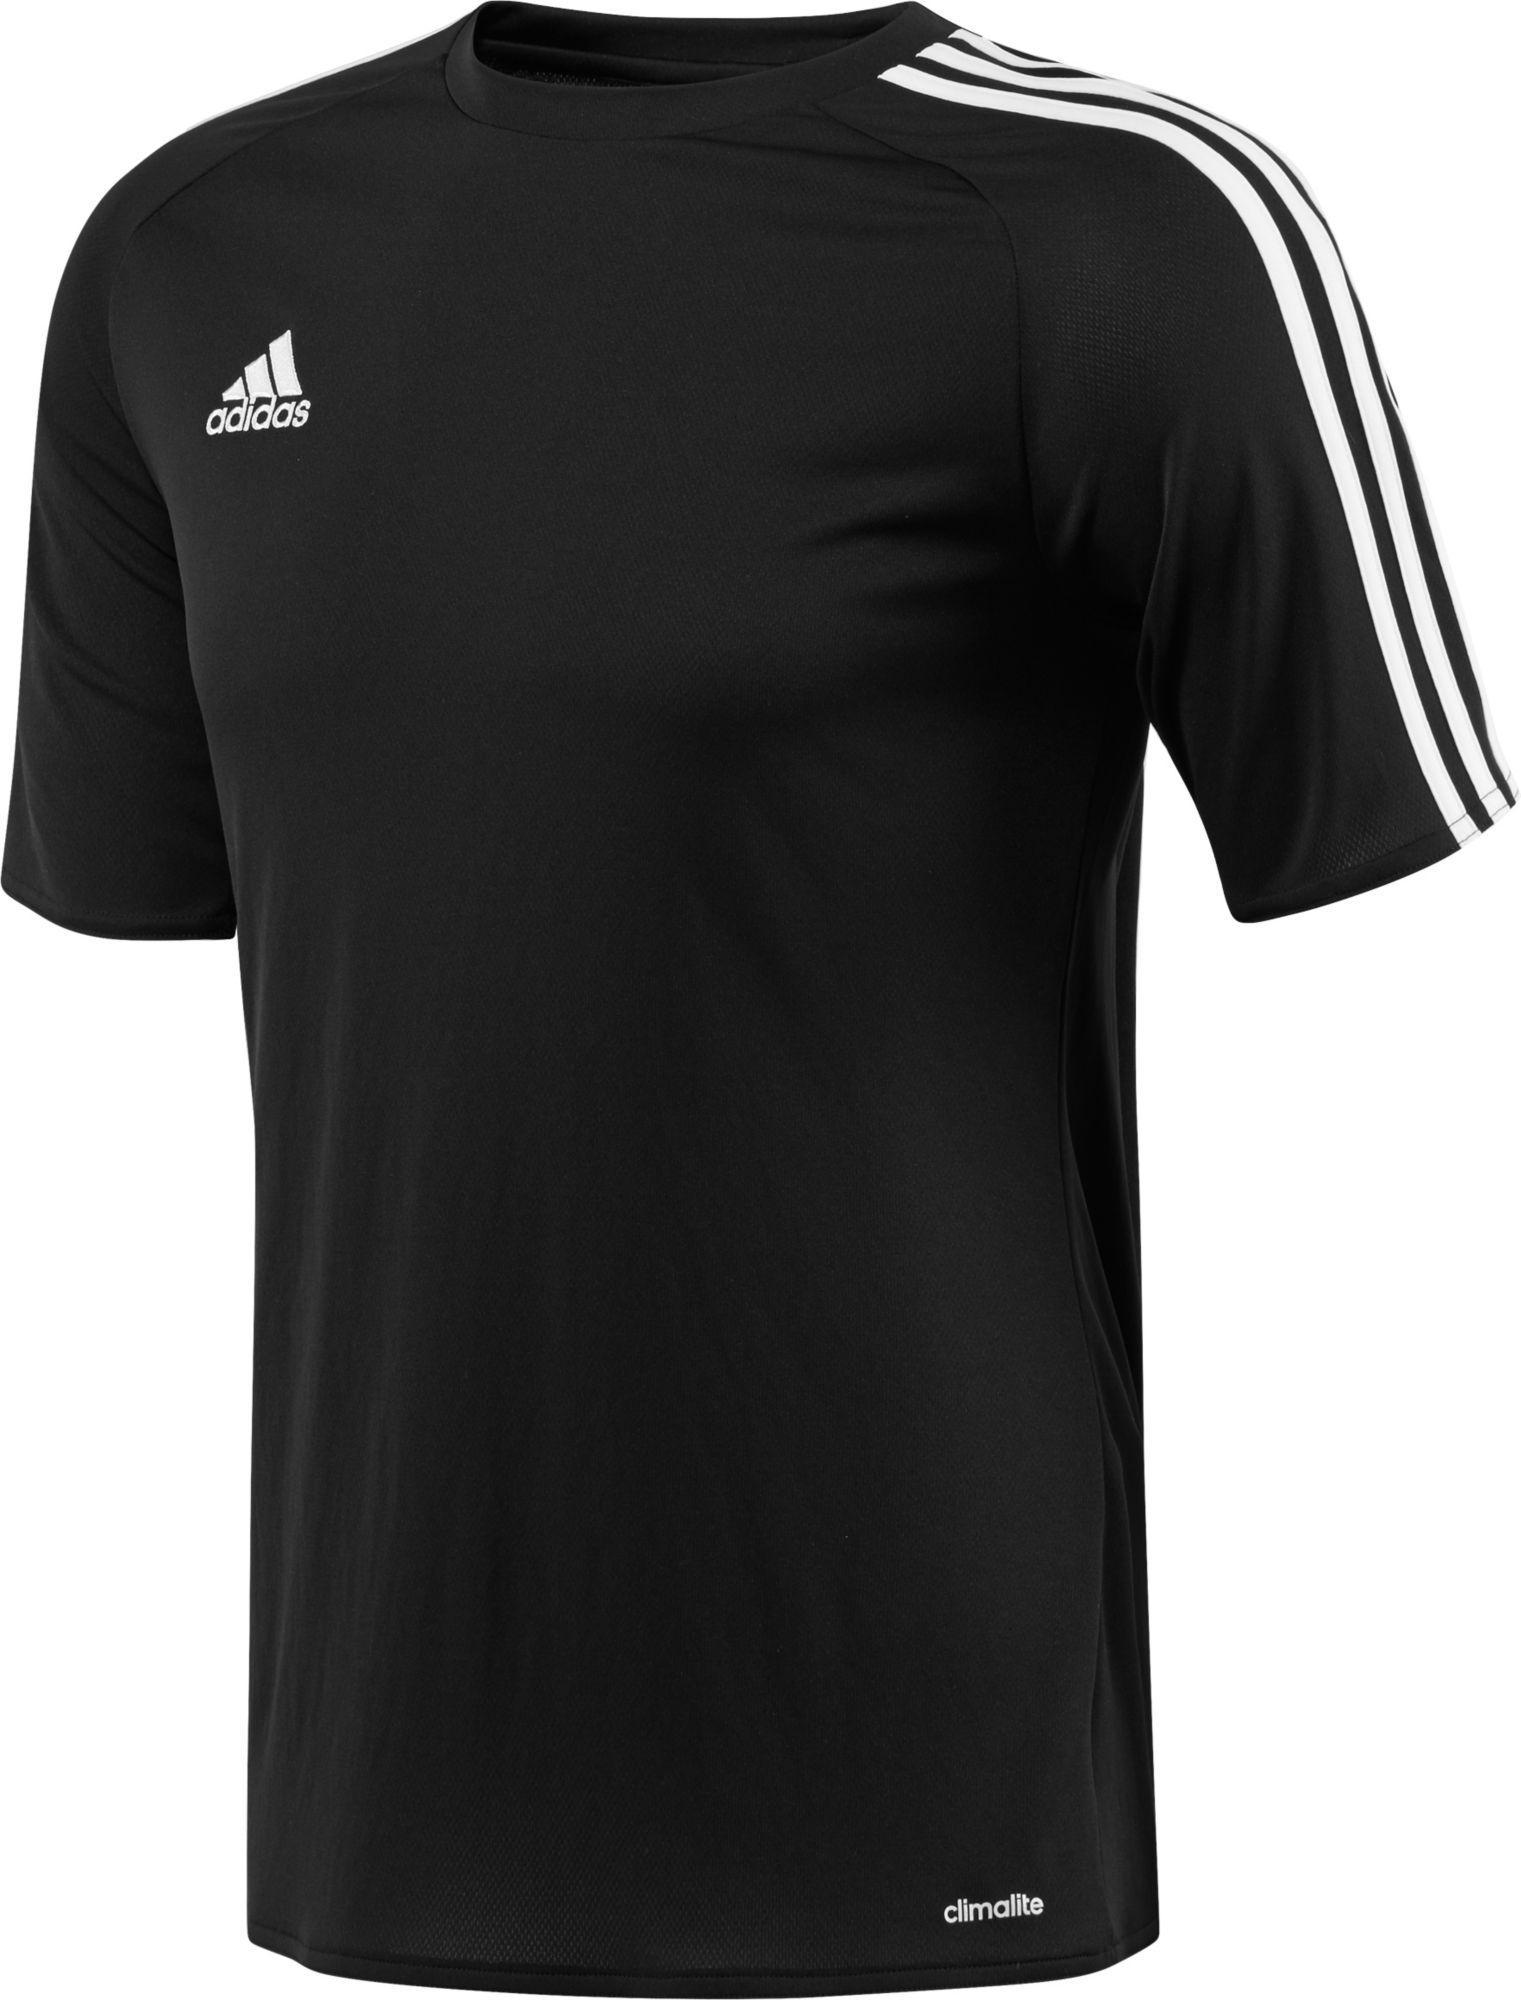 916f8c163 Lyst - Adidas Estro 15 Short Sleeve Soccer Jerse in Black for Men